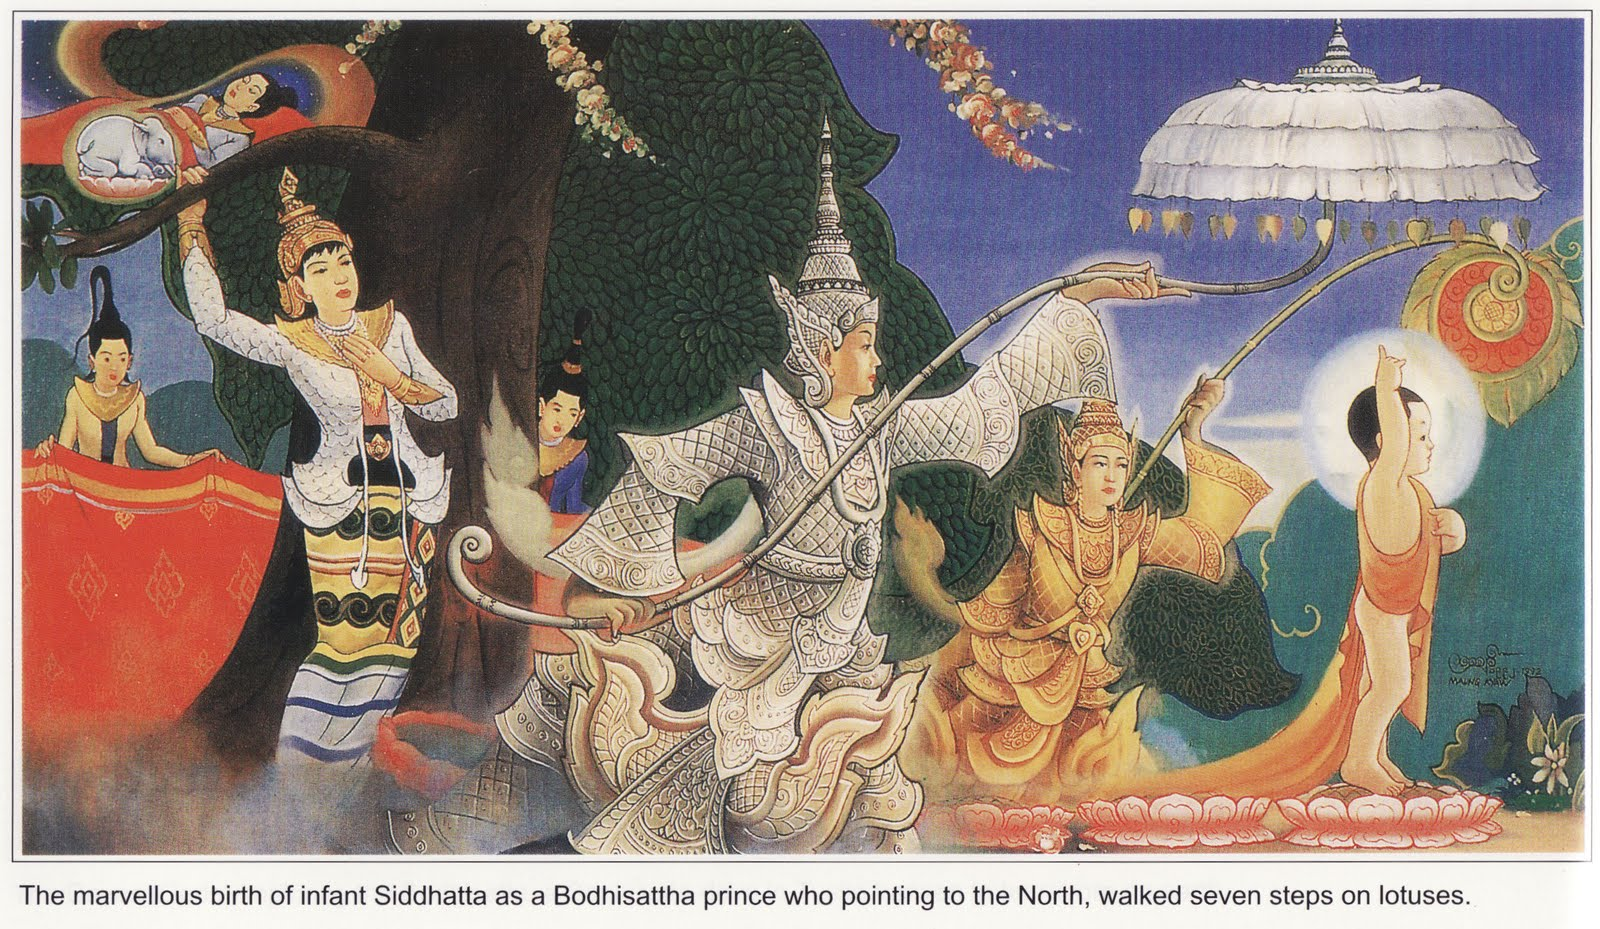 http://1.bp.blogspot.com/-8c9tCQxiU2M/TXFsUG0hb6I/AAAAAAAASaI/M1YeyHaC-Xc/s1600/b%2Buddha%2Bbirth%2Blife-of-buddha-8.jpg